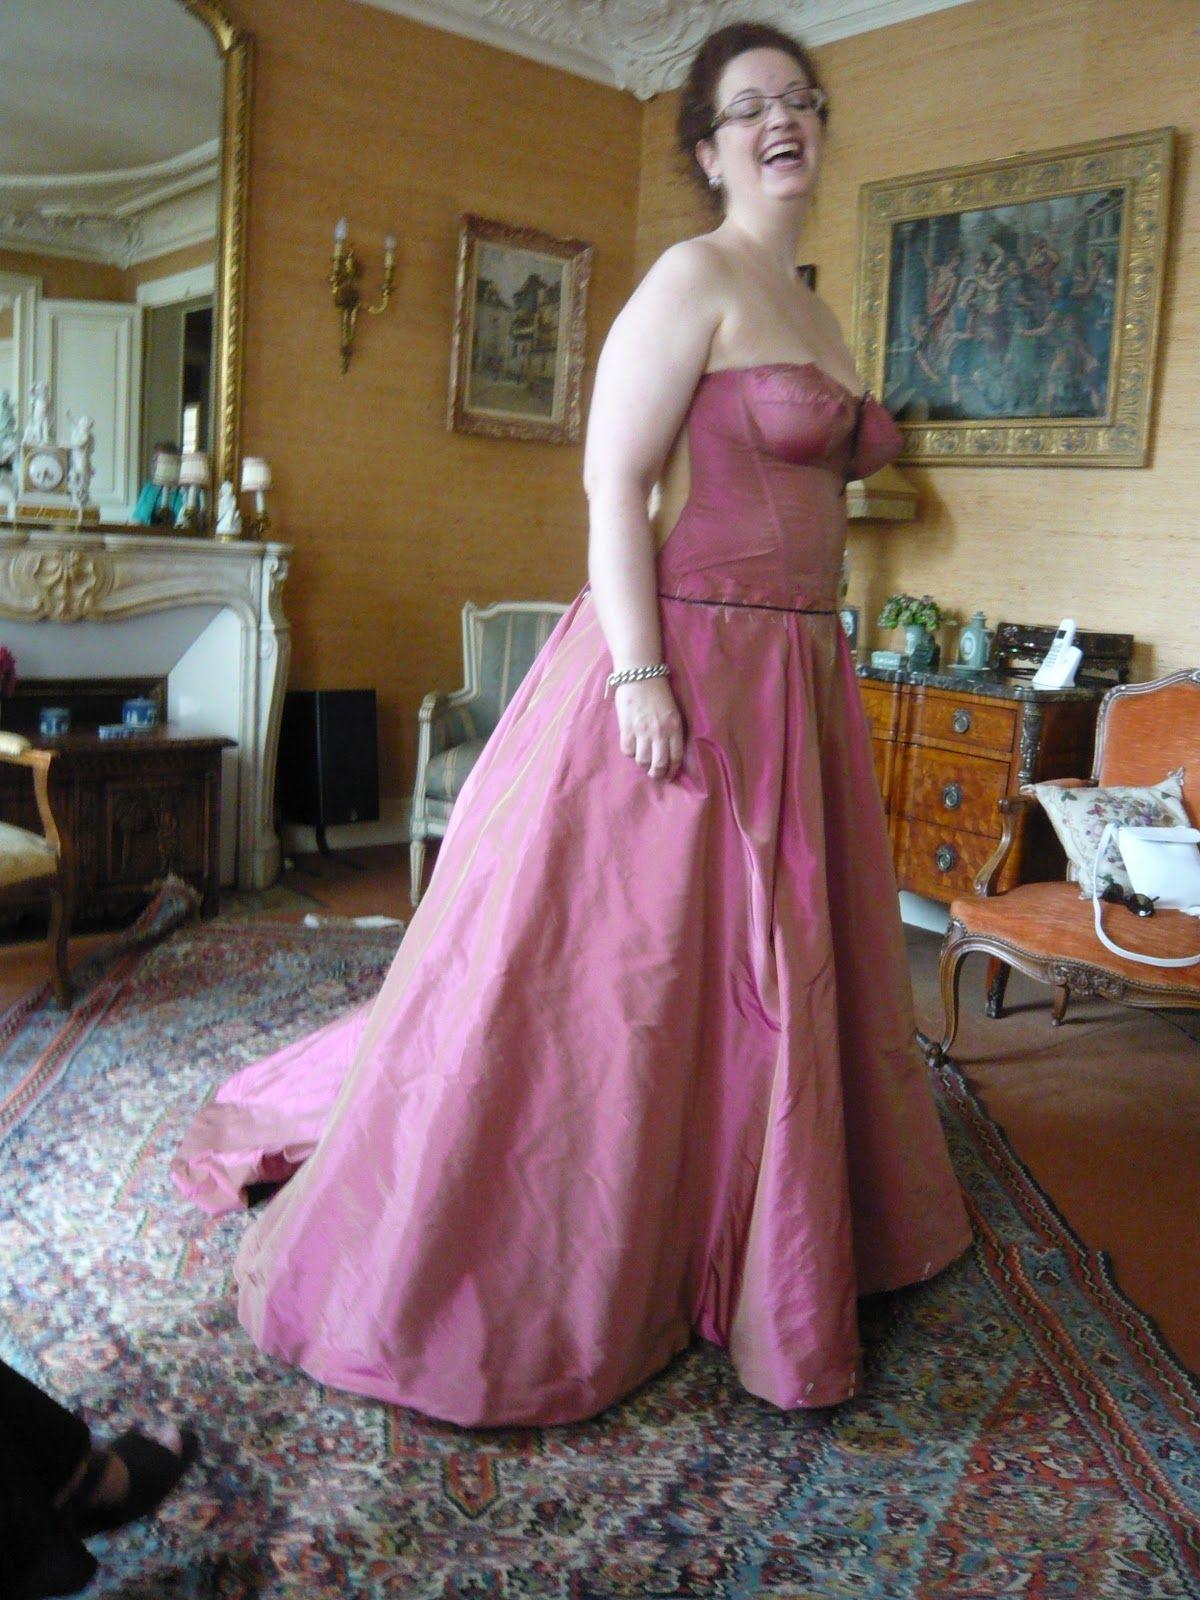 Arnaud Lance - Haute Couture . Paris - تصميم الازياء - باريس: Robe en taffetas rose pour Ann Hallenberg (Mezzo-Soprano)